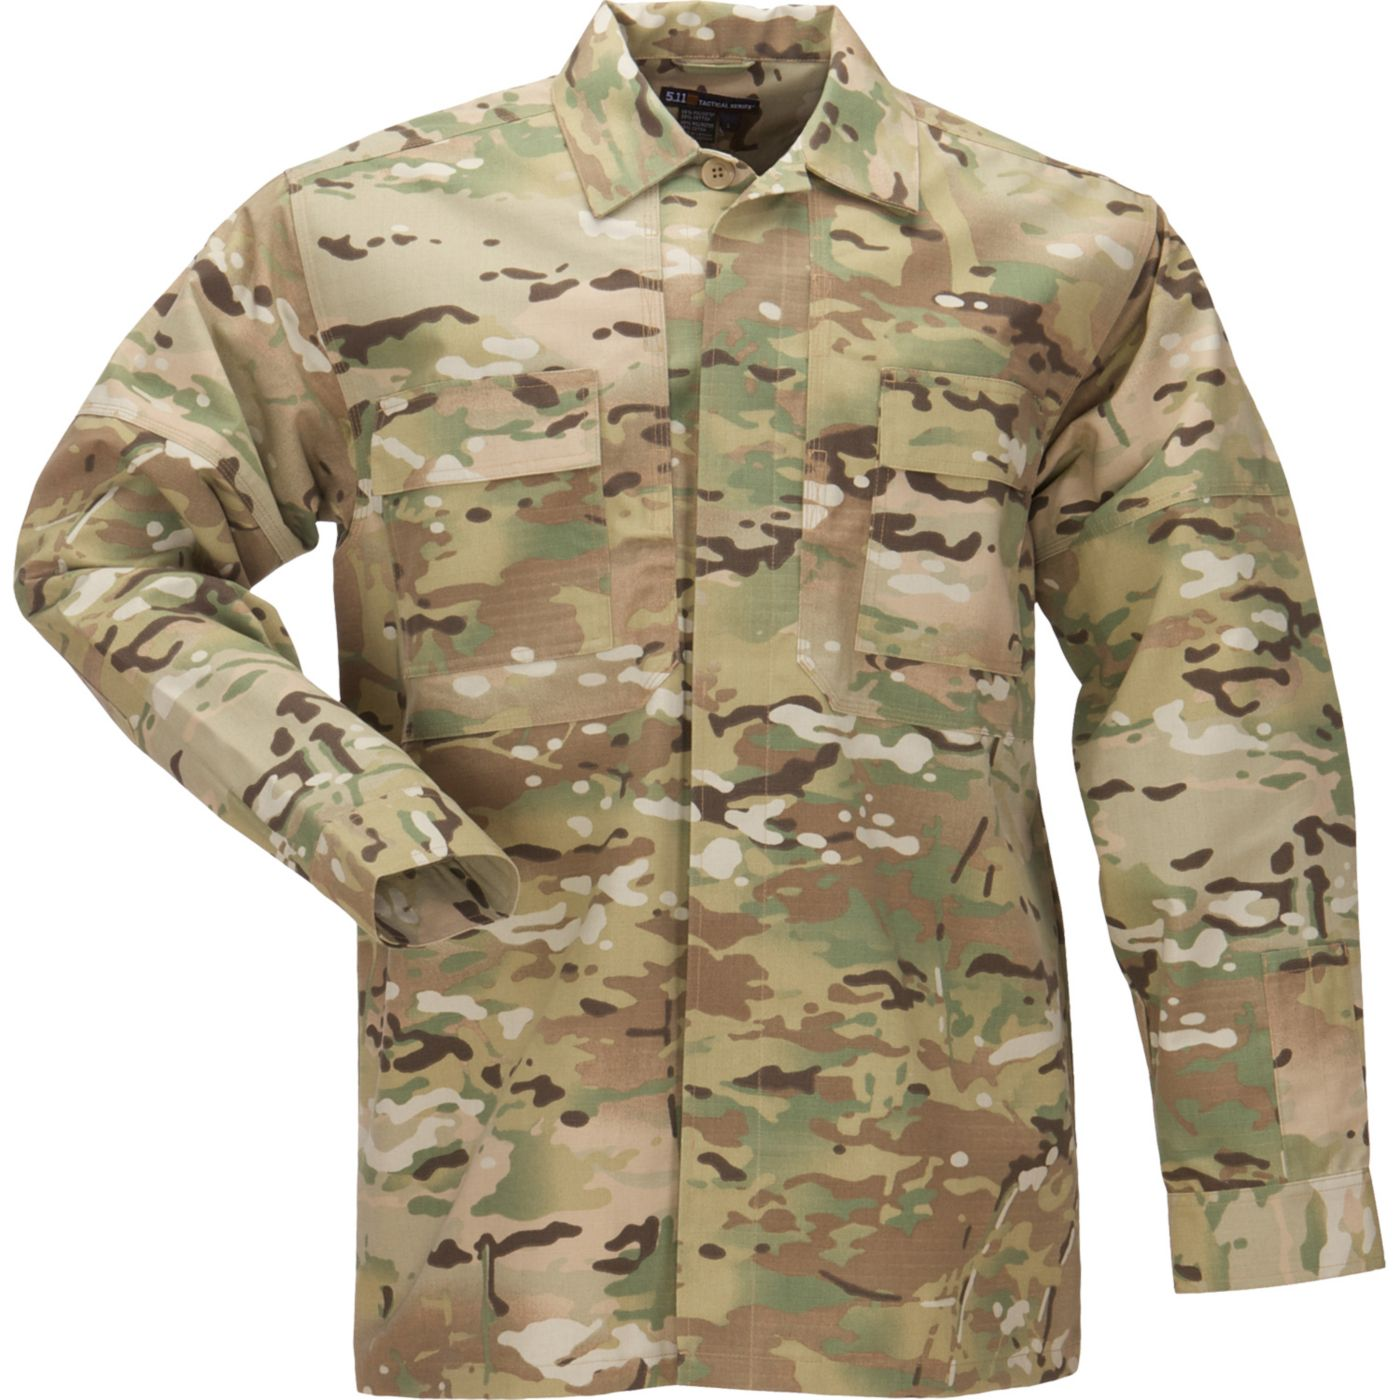 5.11 Tactical Men's Ripstop MultiCam TDU Long Sleeve Shirt - Big & Tall